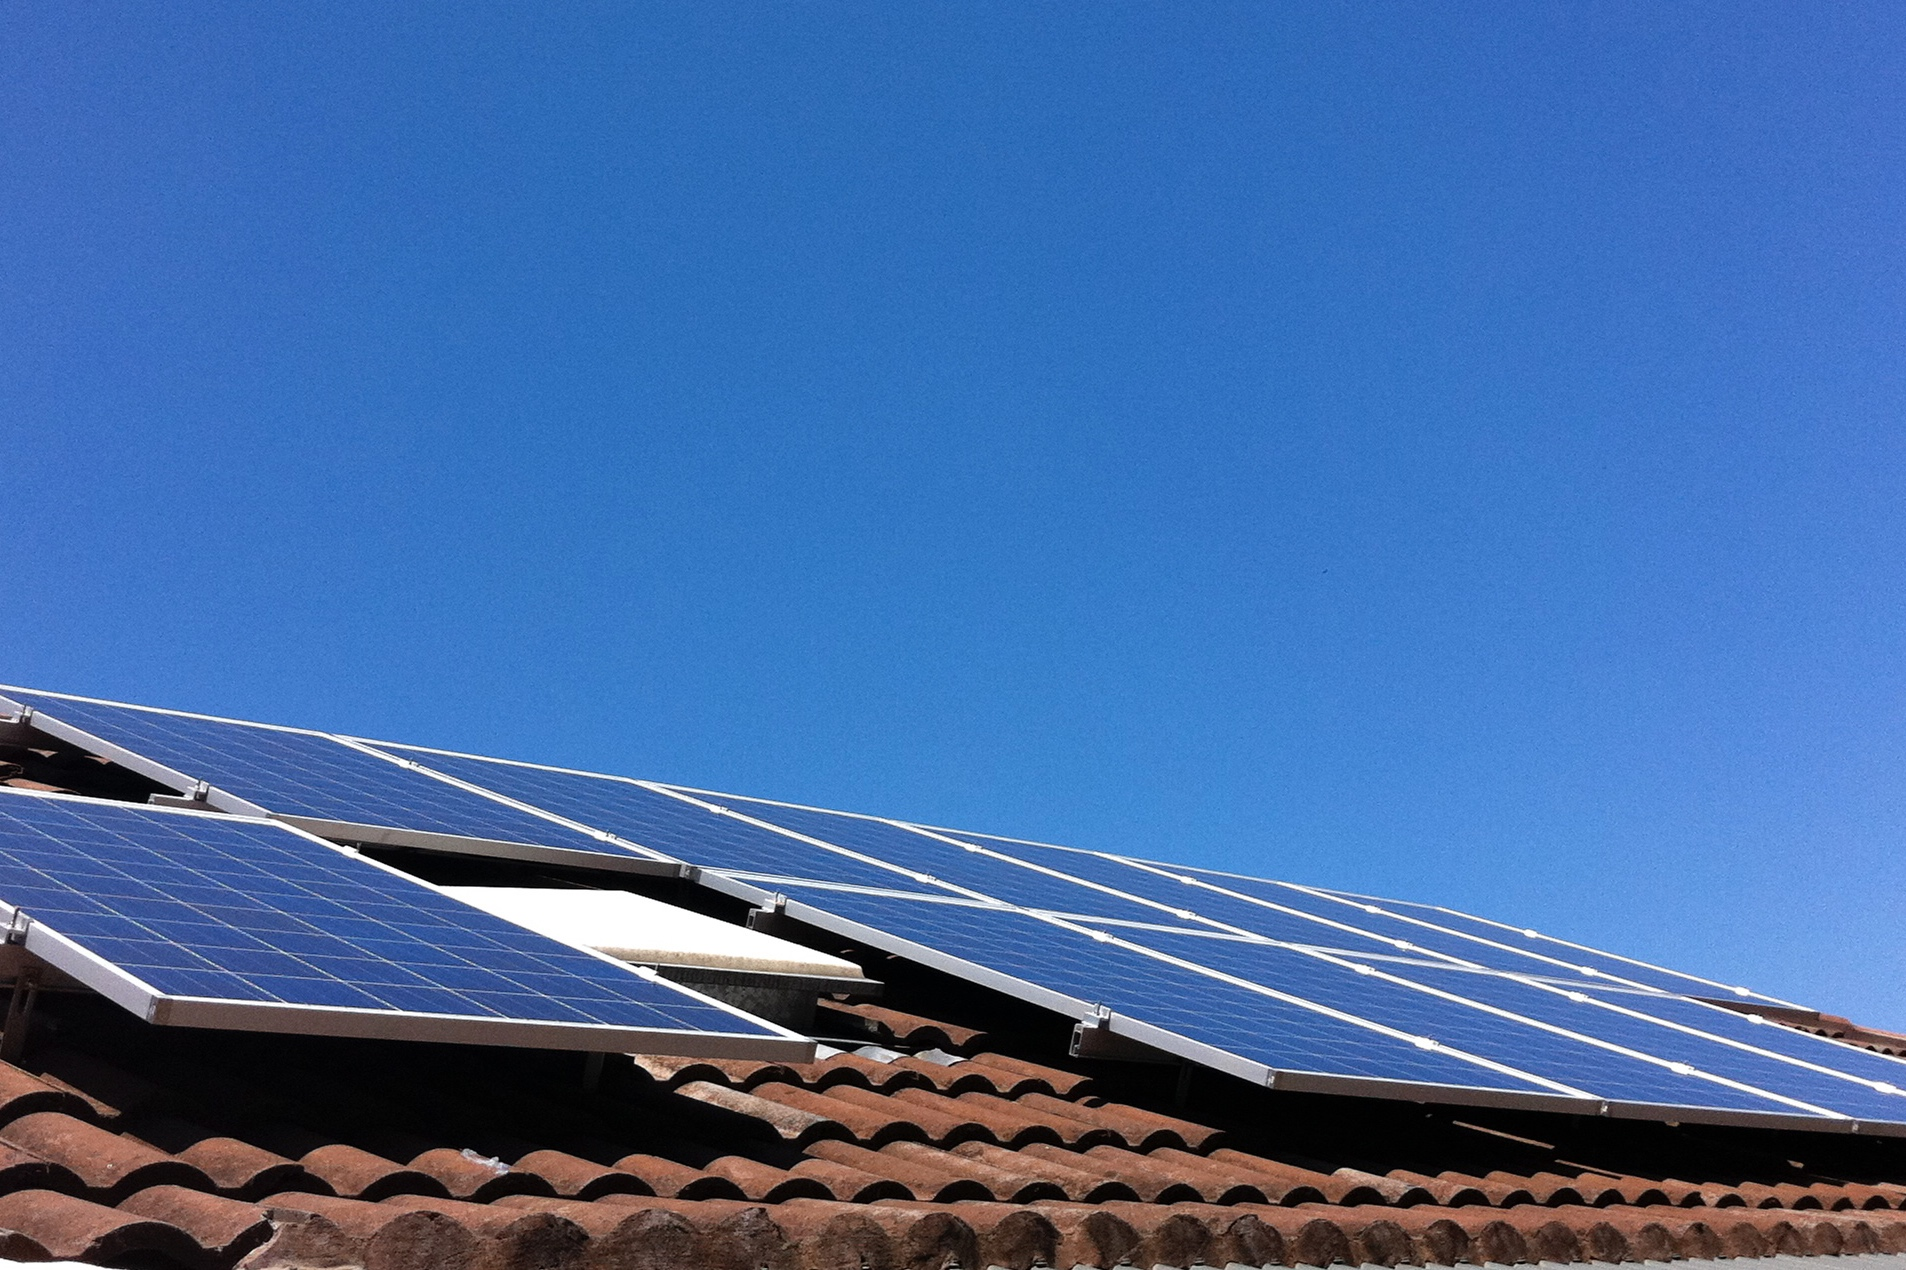 2011: 2.53kW system in Croydon, Victoria: